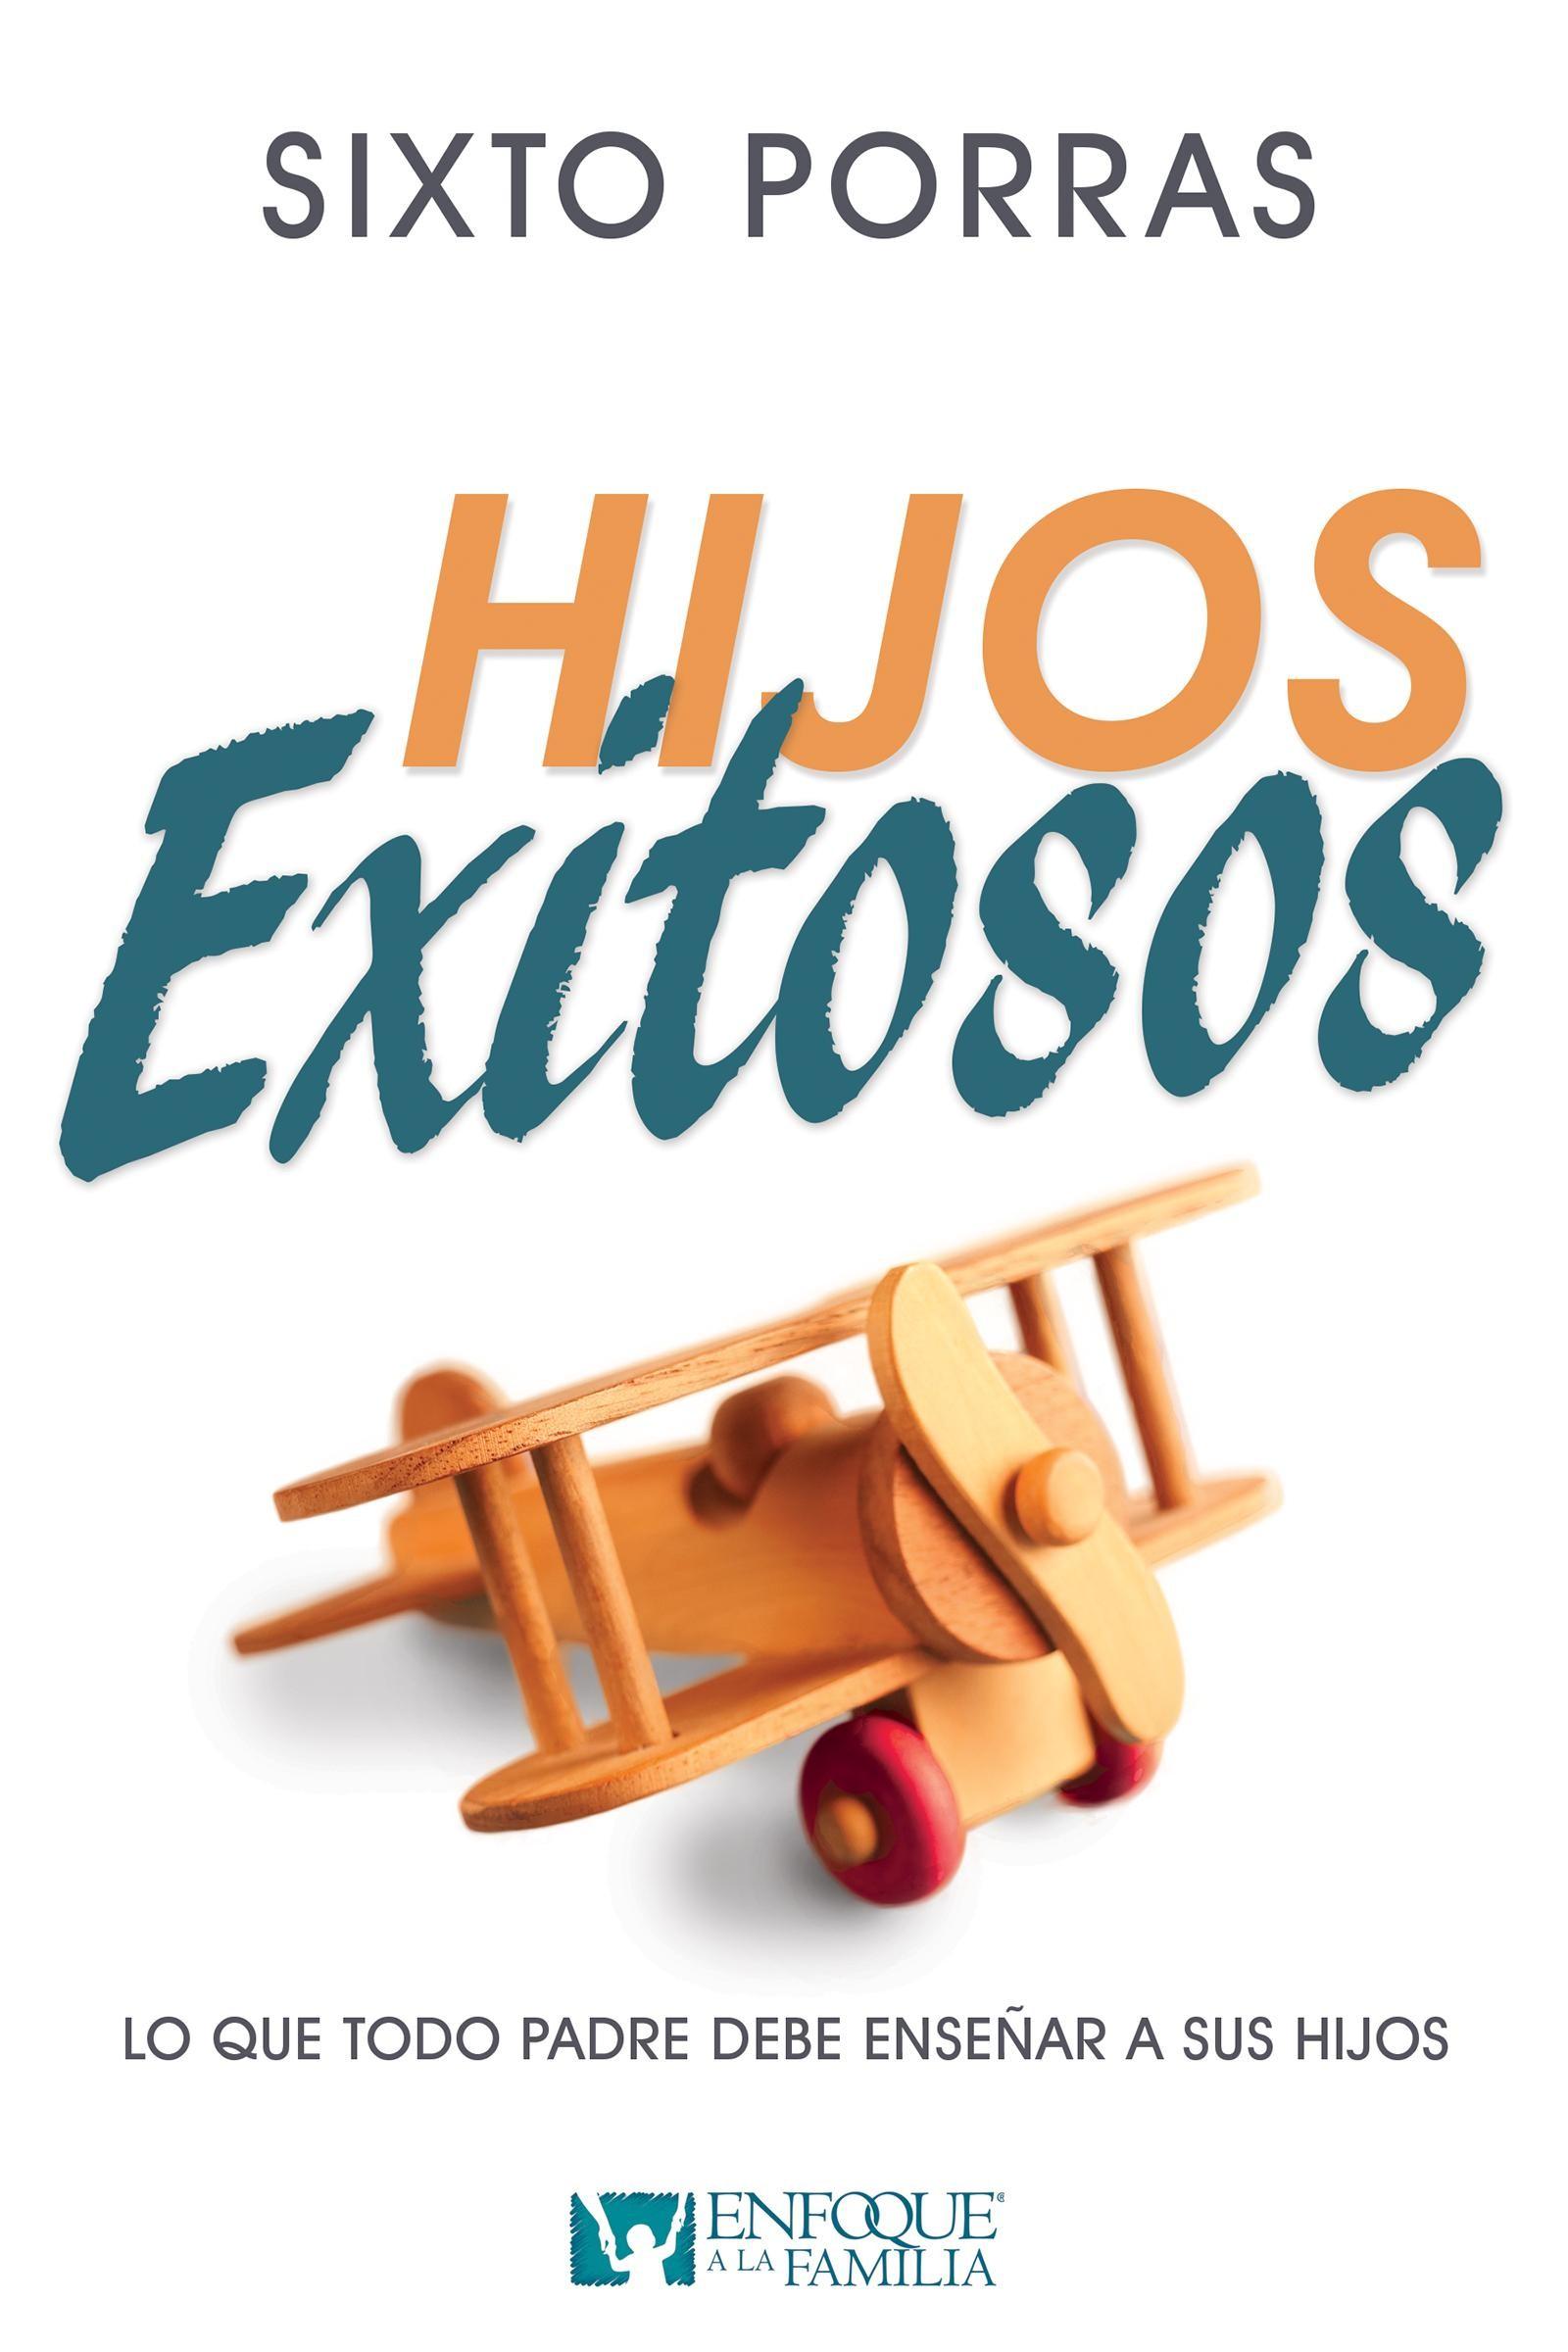 Hijos Exitosos  - 9781629118772 - Porras, Sixto